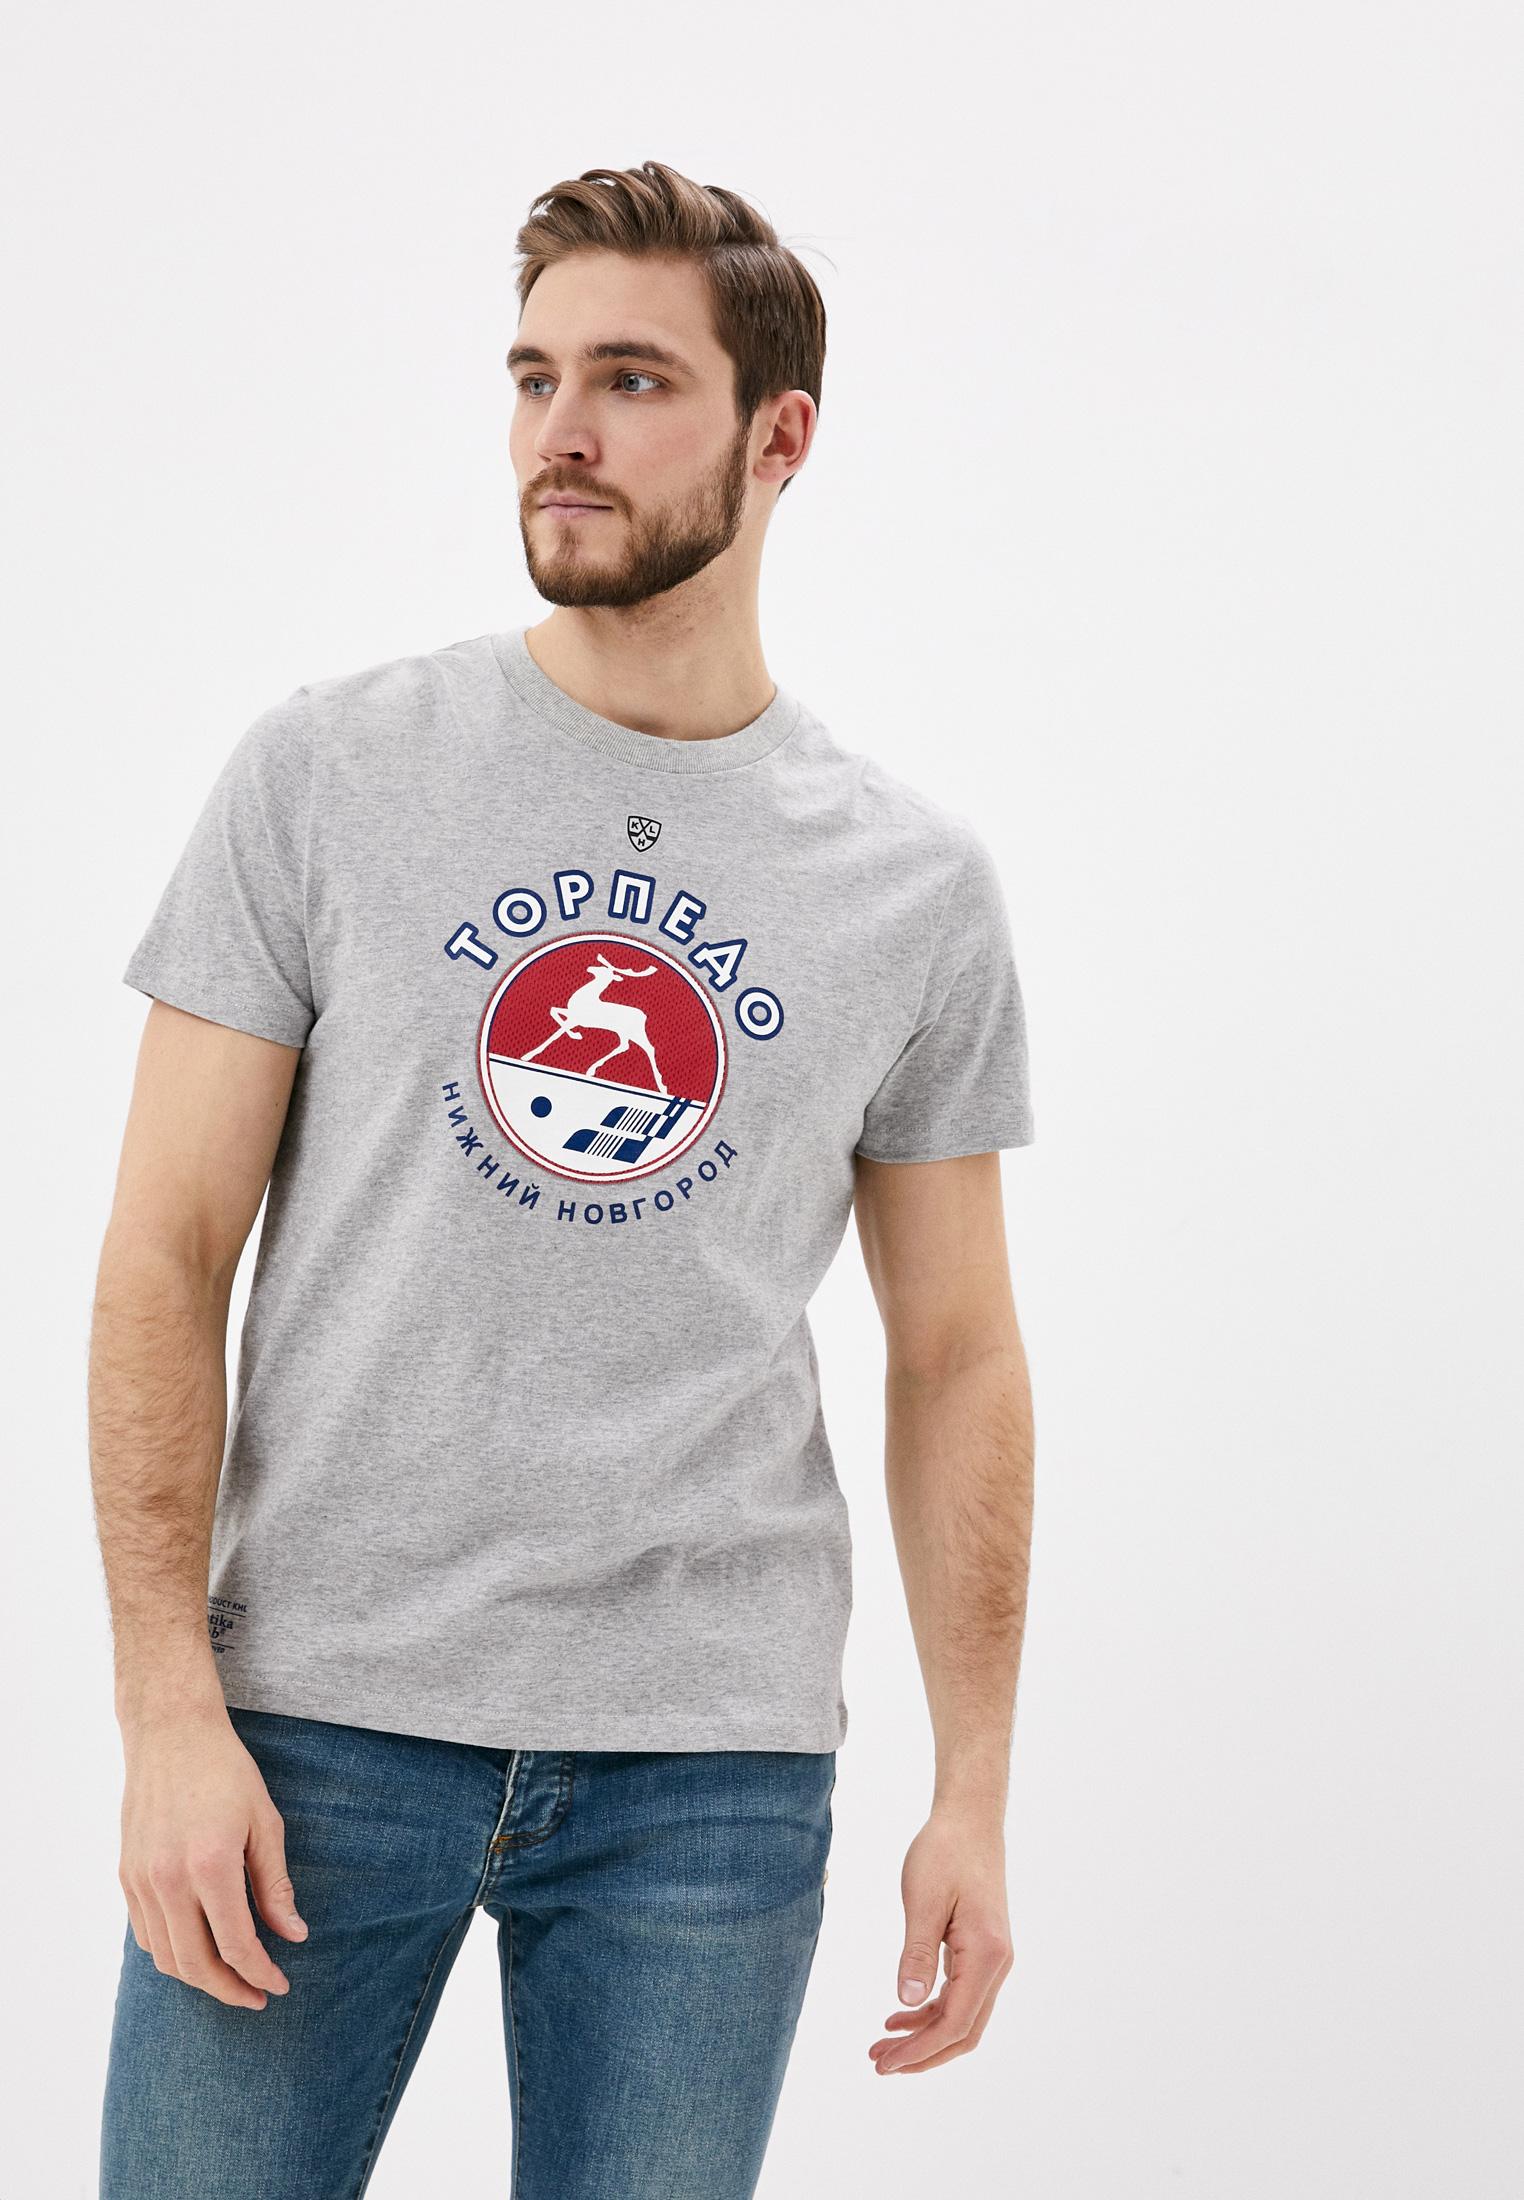 Футболка Atributika & Club™ 271180: изображение 1